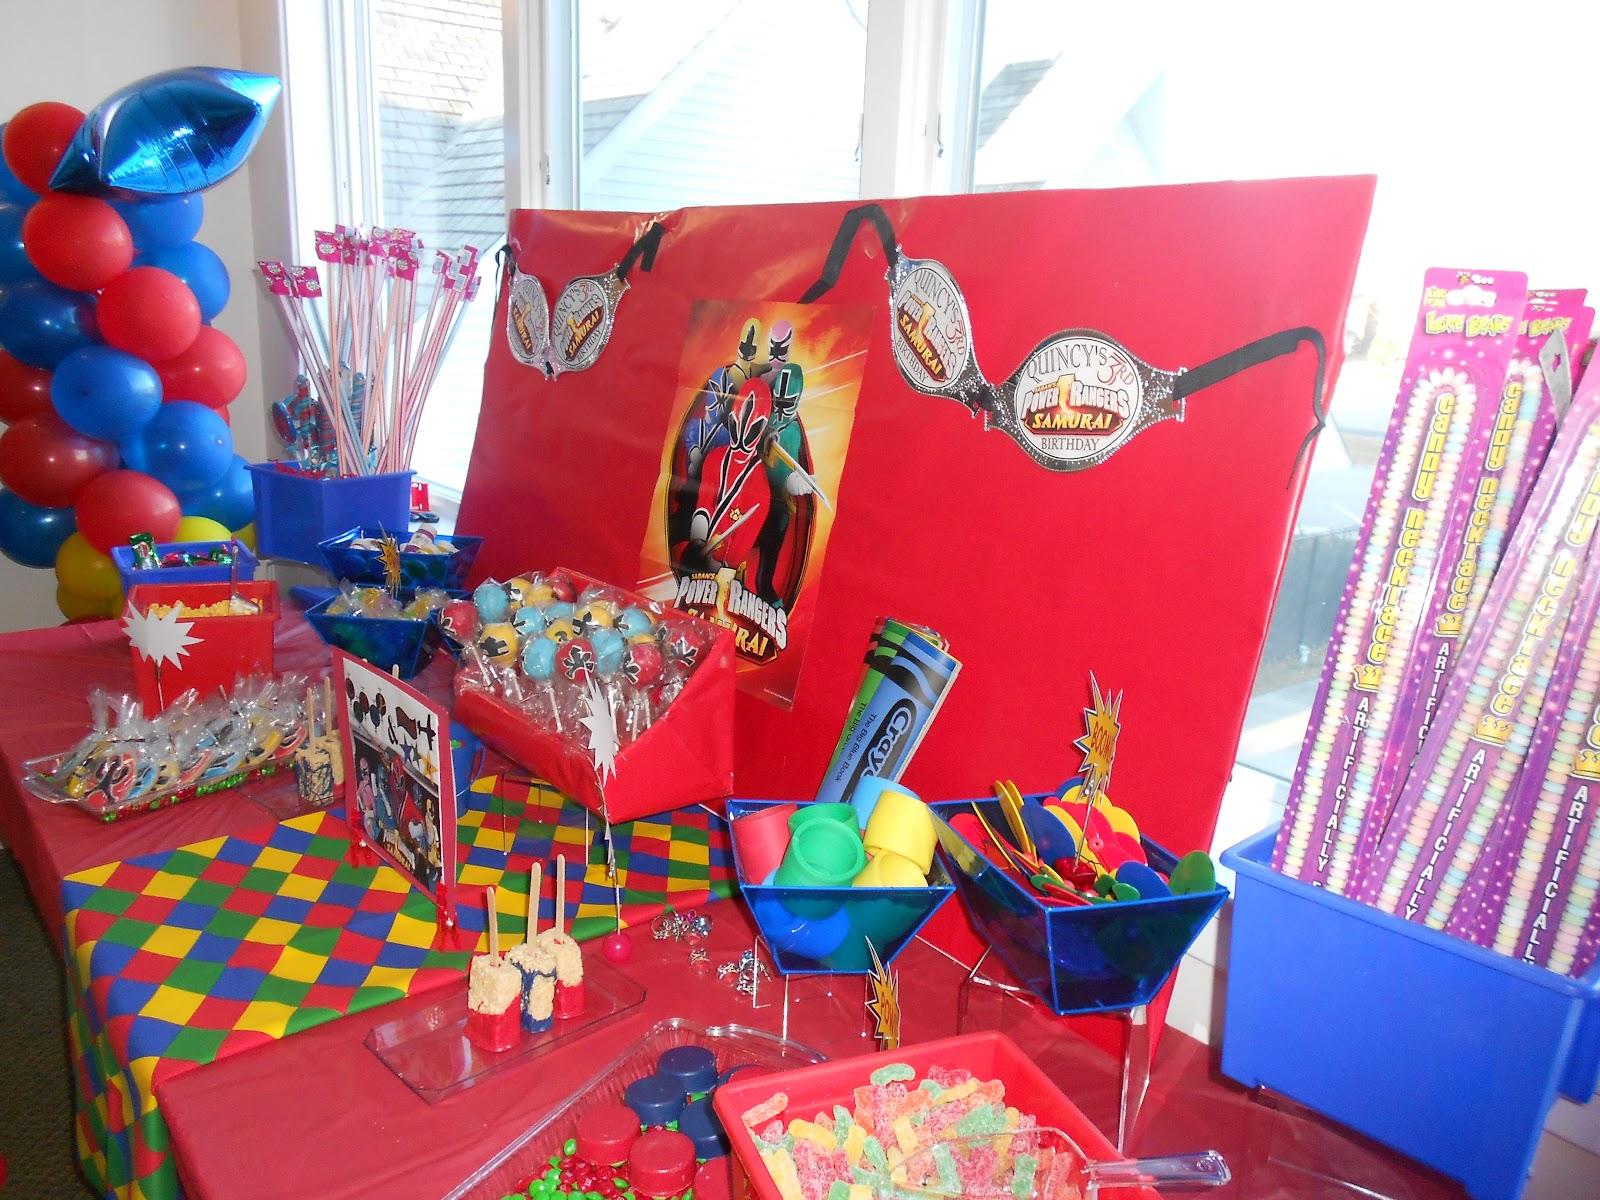 Birthday Birthday Party Ideas: Leslie P's Creations: Power Ranger Birthday